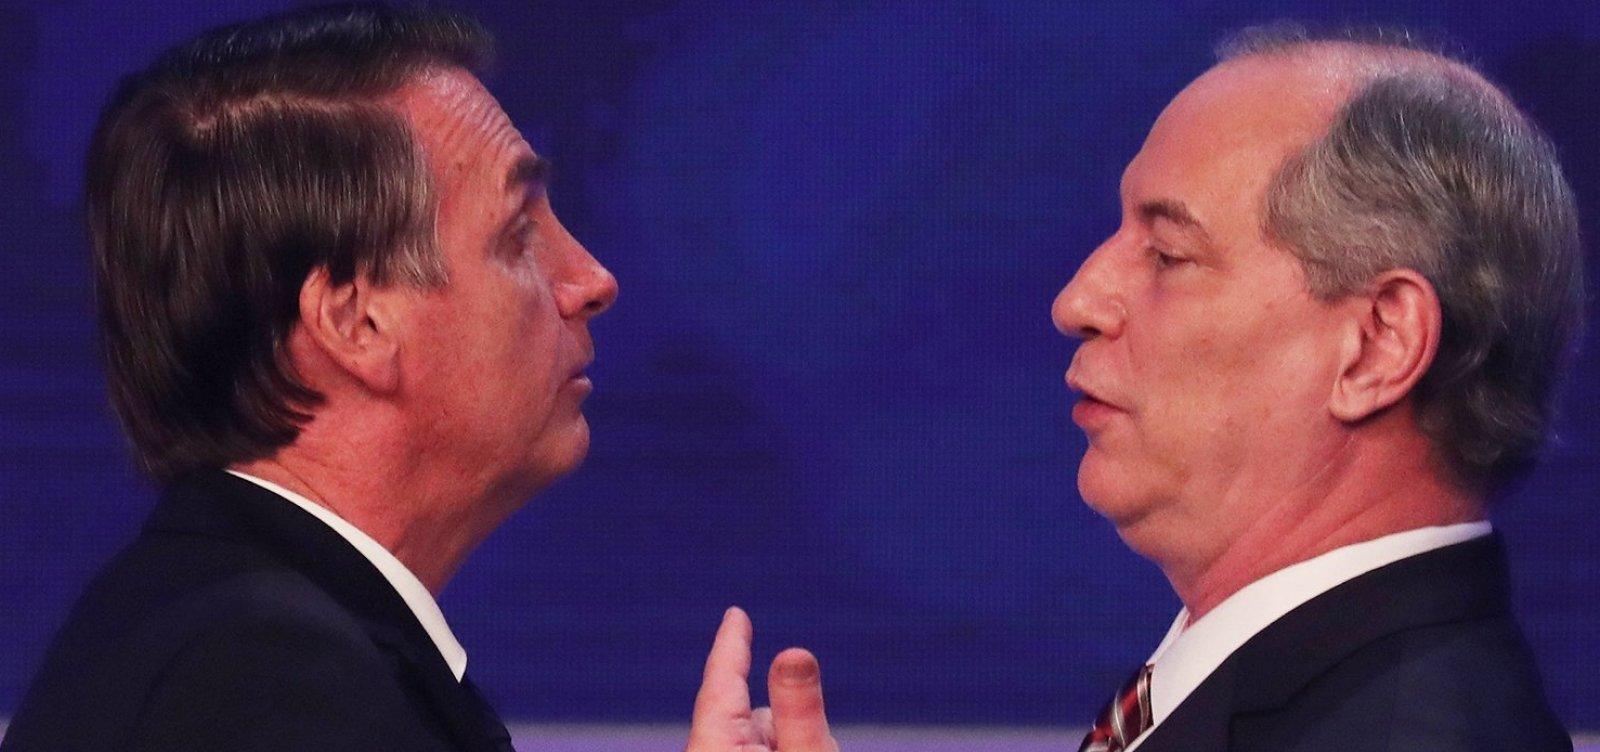 Após ser processado por Bolsonaro, Ciro Gomes debocha: 'Justiça será feita'